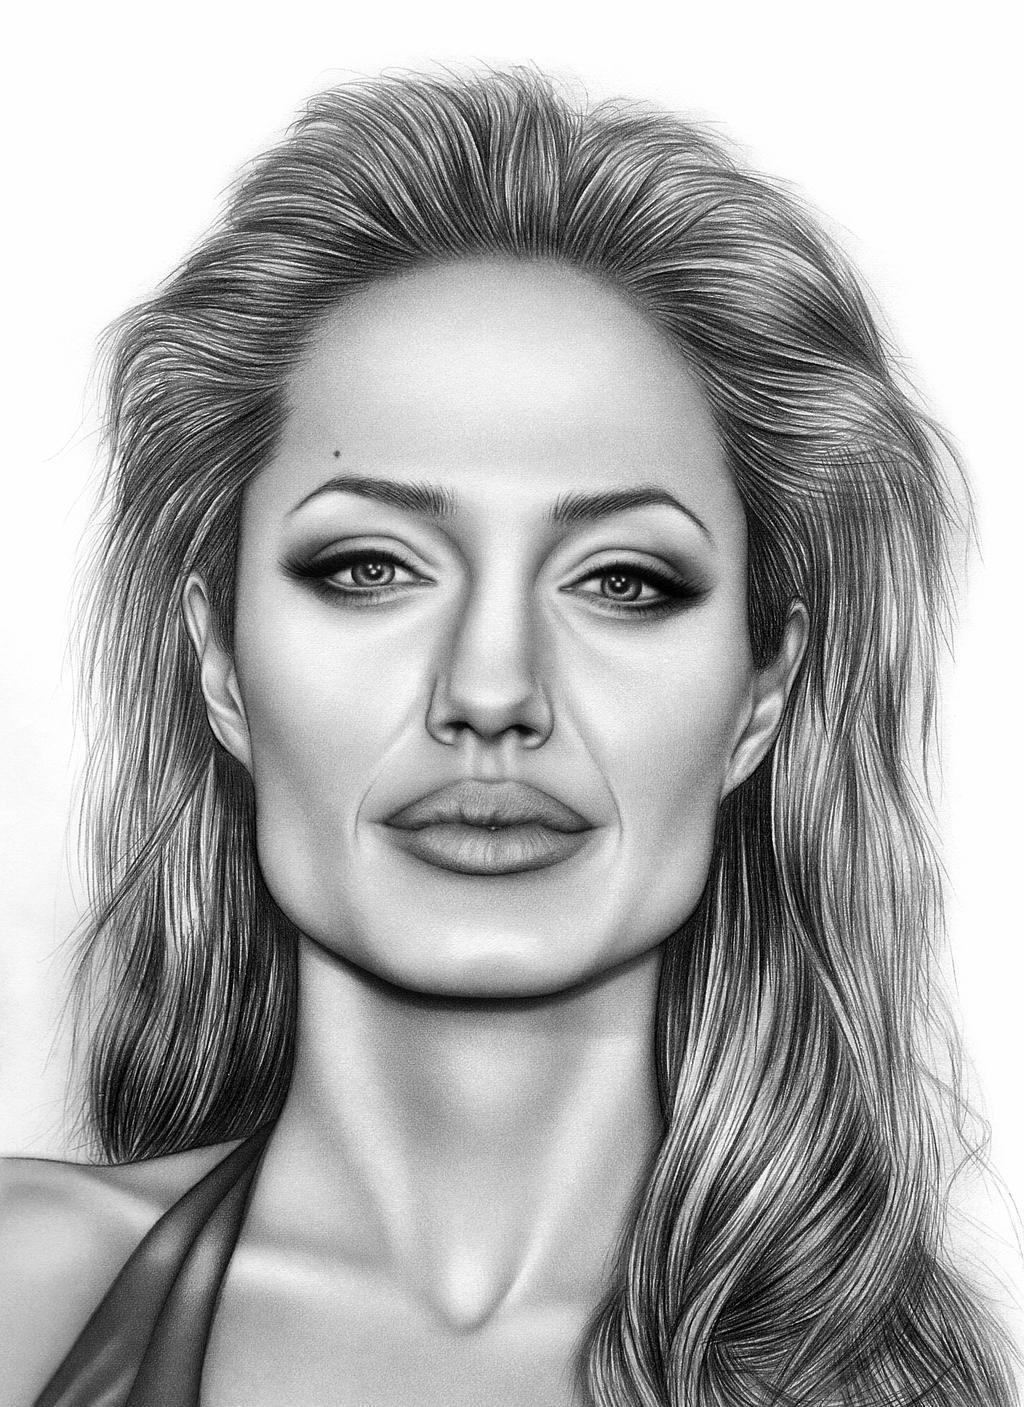 Angelina Jolie By AdamAlexisRyan On DeviantArt